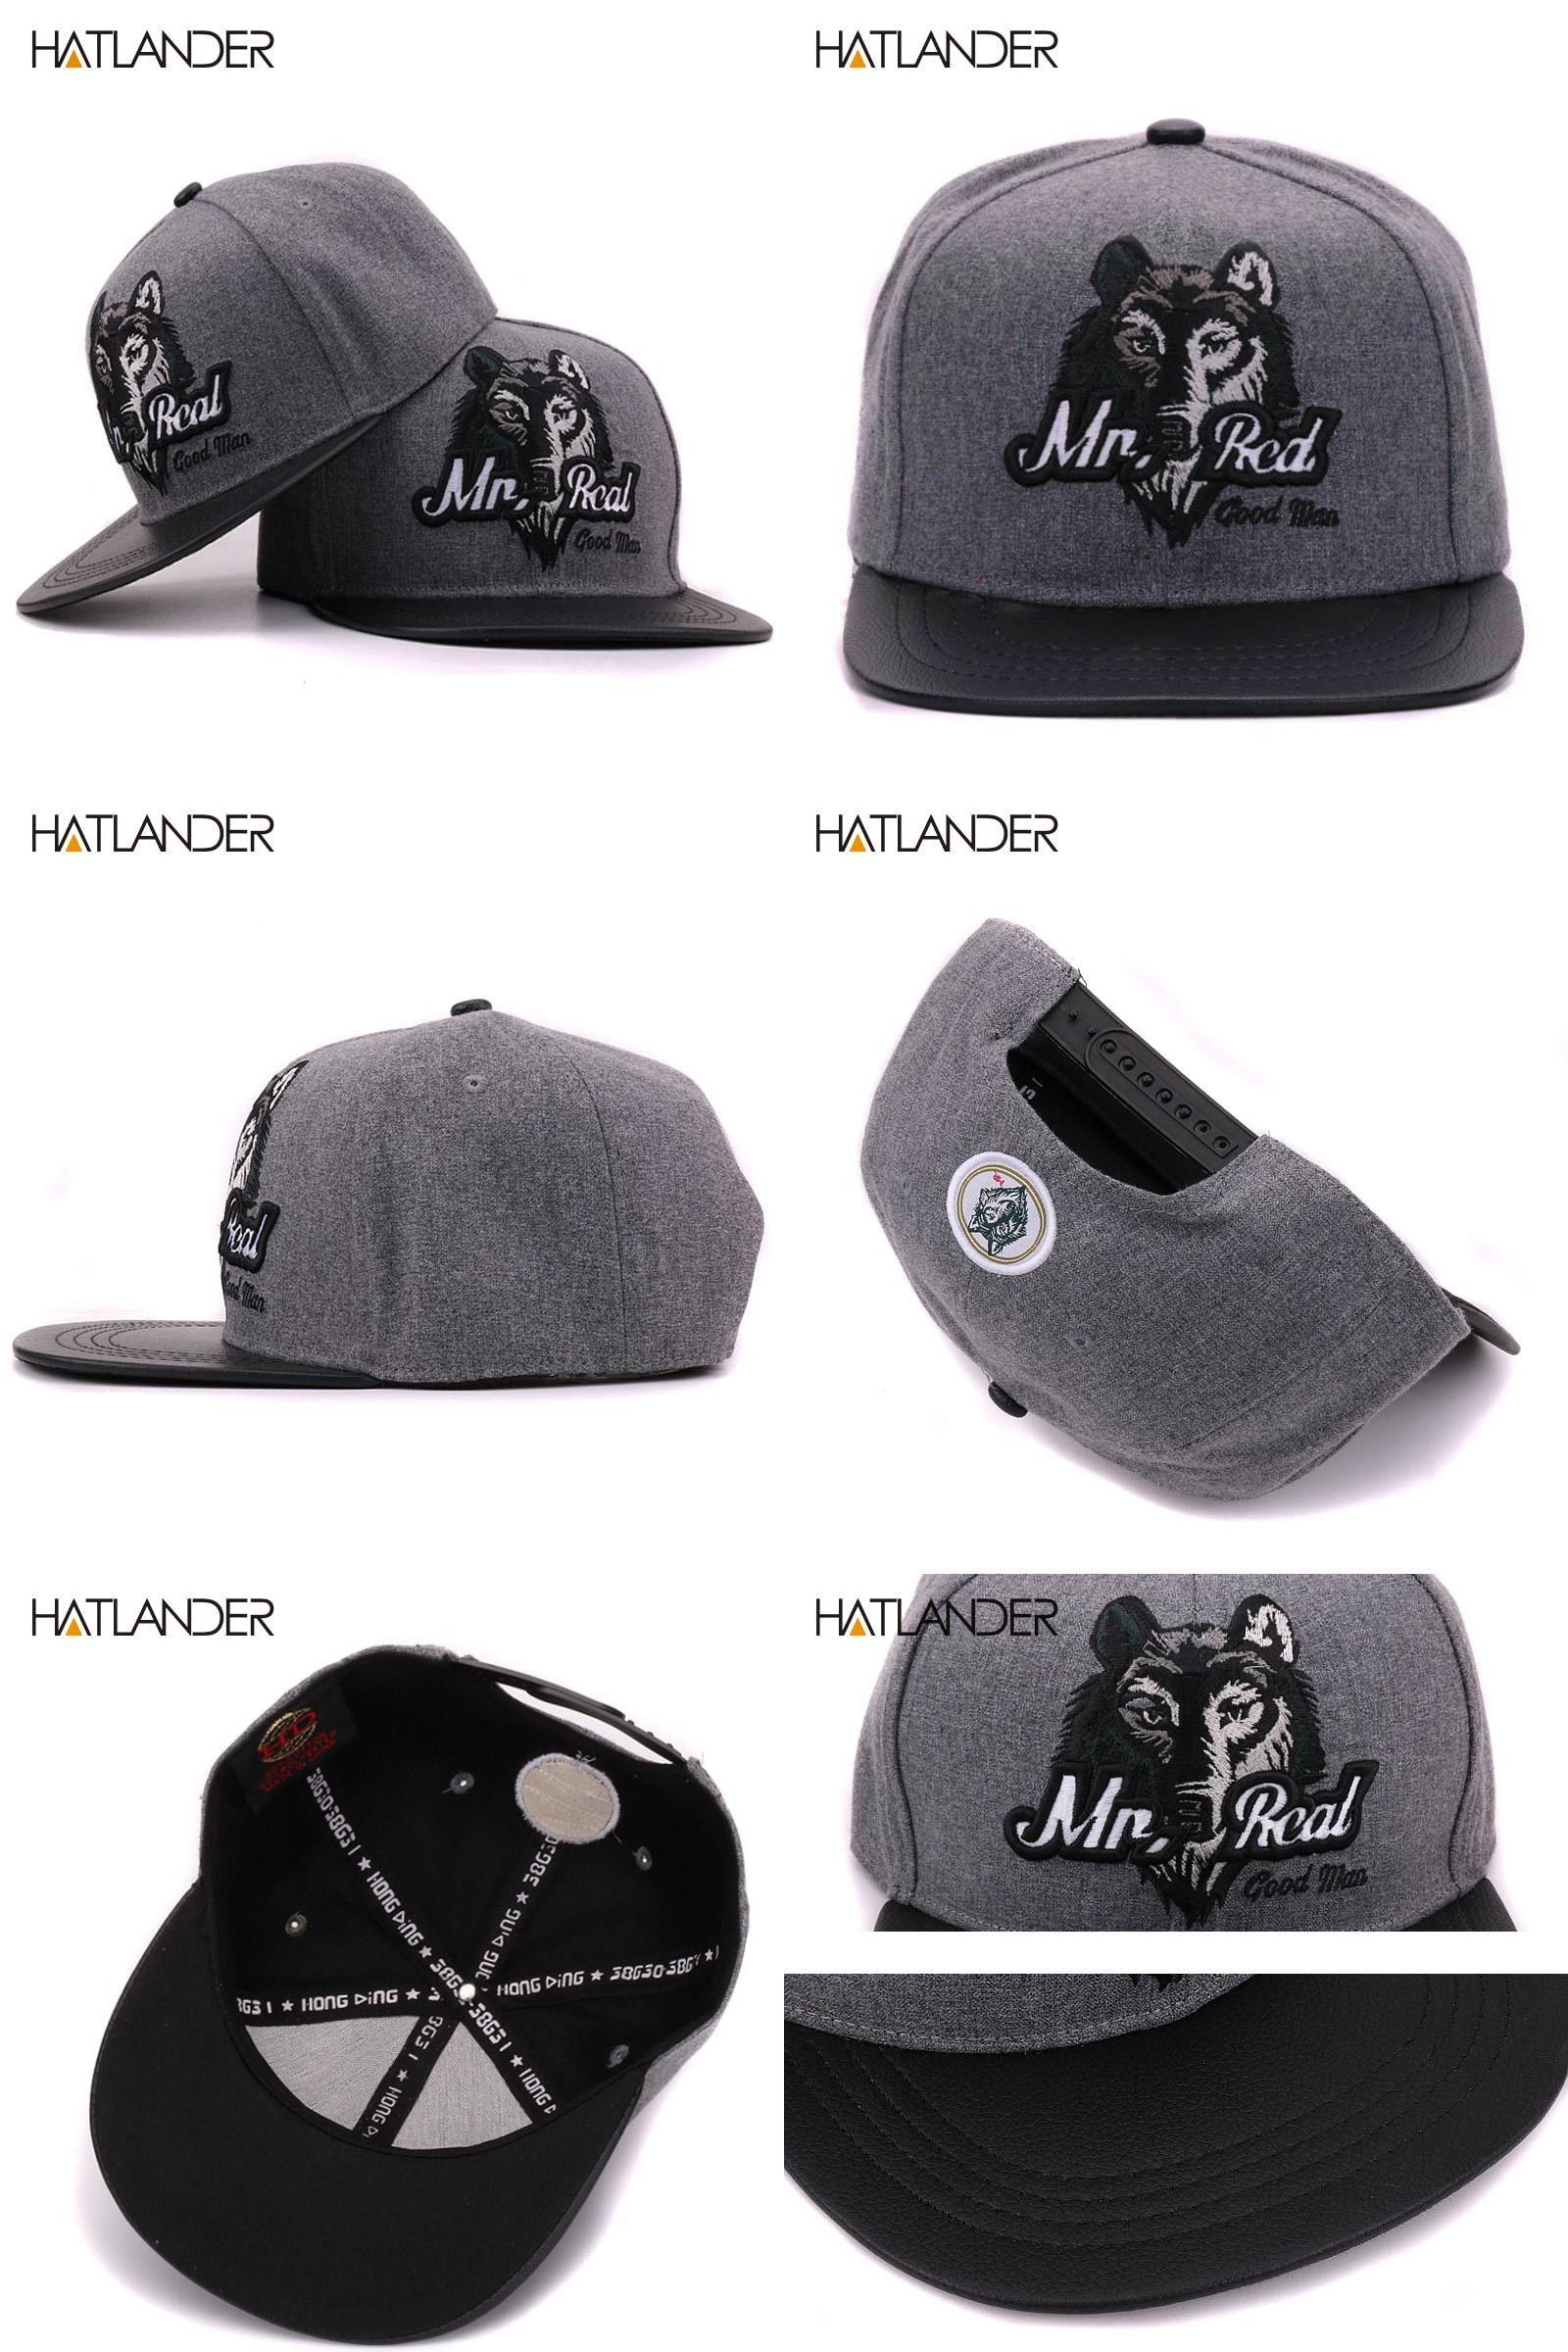 9ee9ca75b69  Visit to Buy  HATLANDER 2017 Grey men hip hop baseball cap fitted flat  brimmed